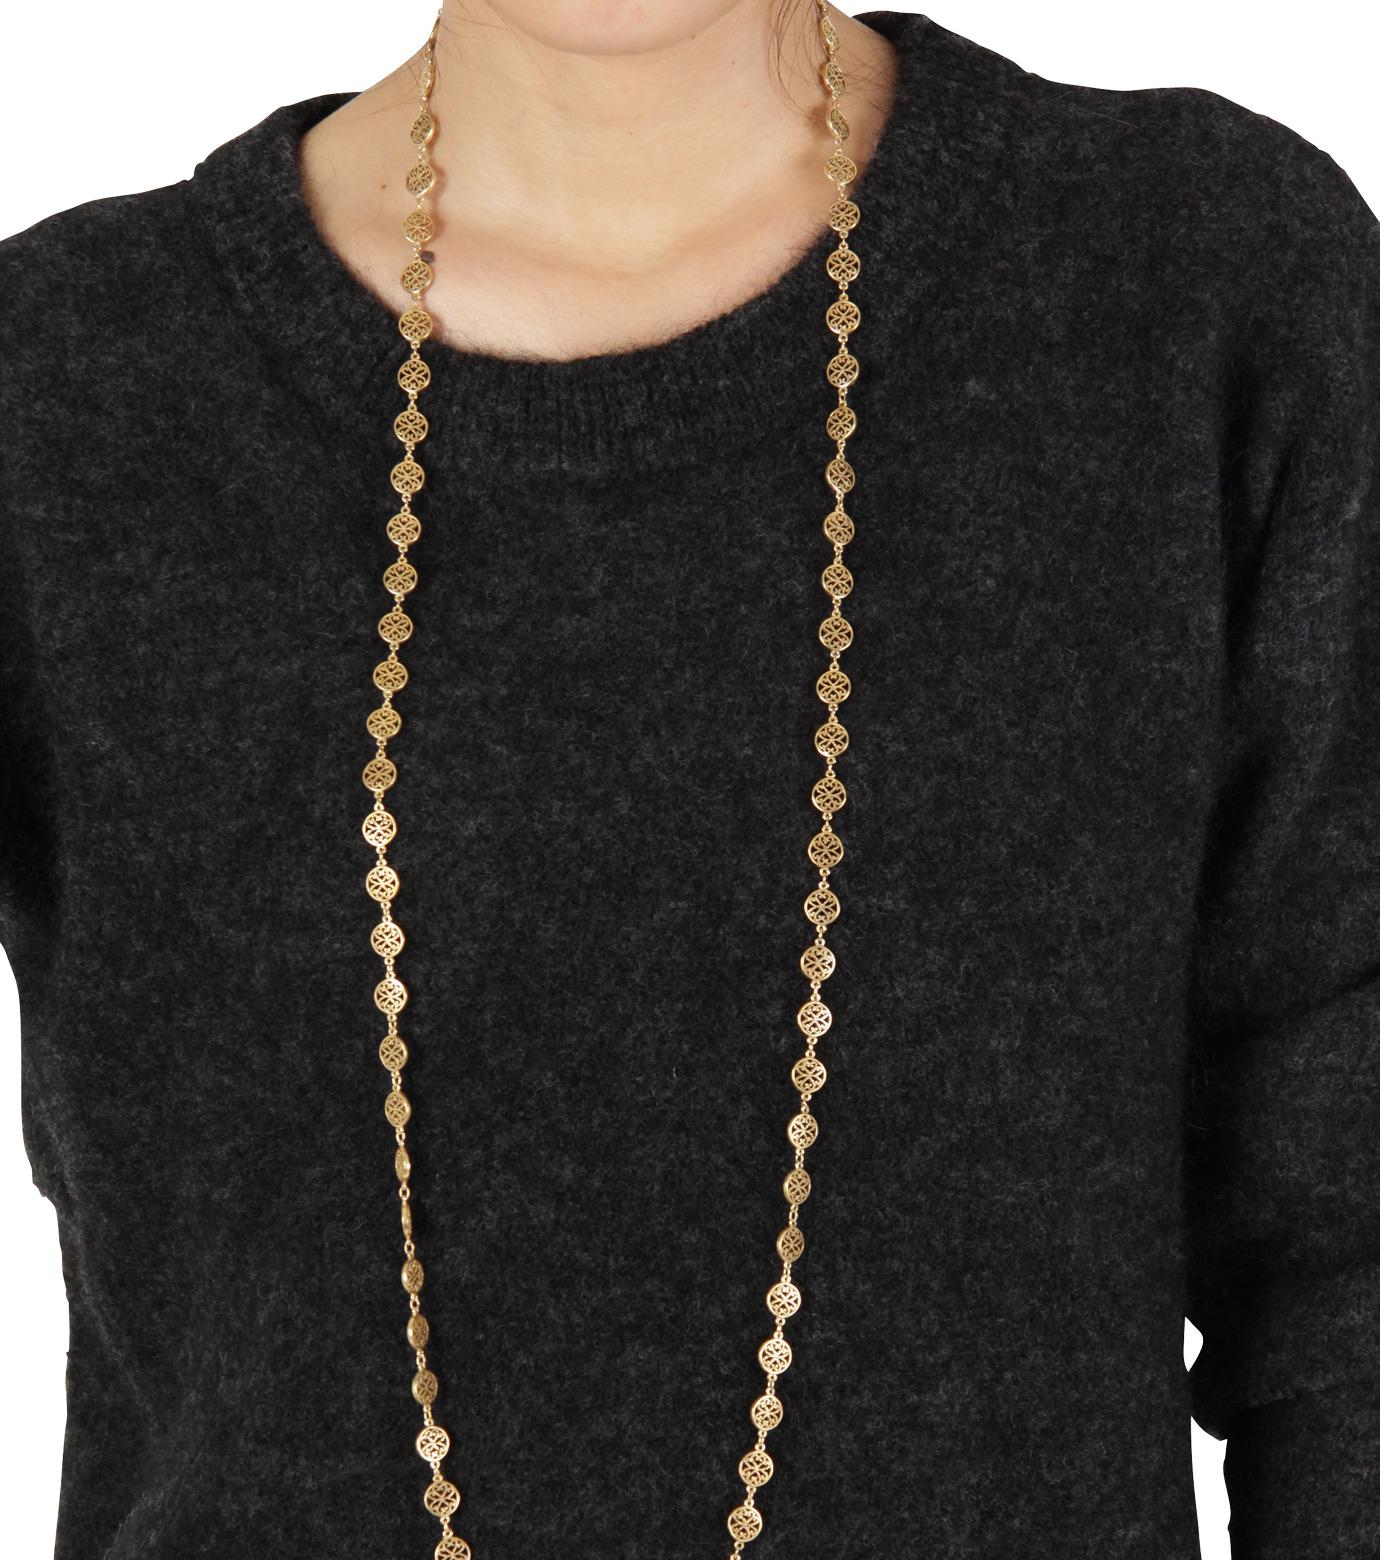 I AM by Ileana Makri(アイ アム バイ イリーナ マクリ)のAntoinette Necklace-GOLD(ネックレス/necklace)-O804-61-099-2 拡大詳細画像3